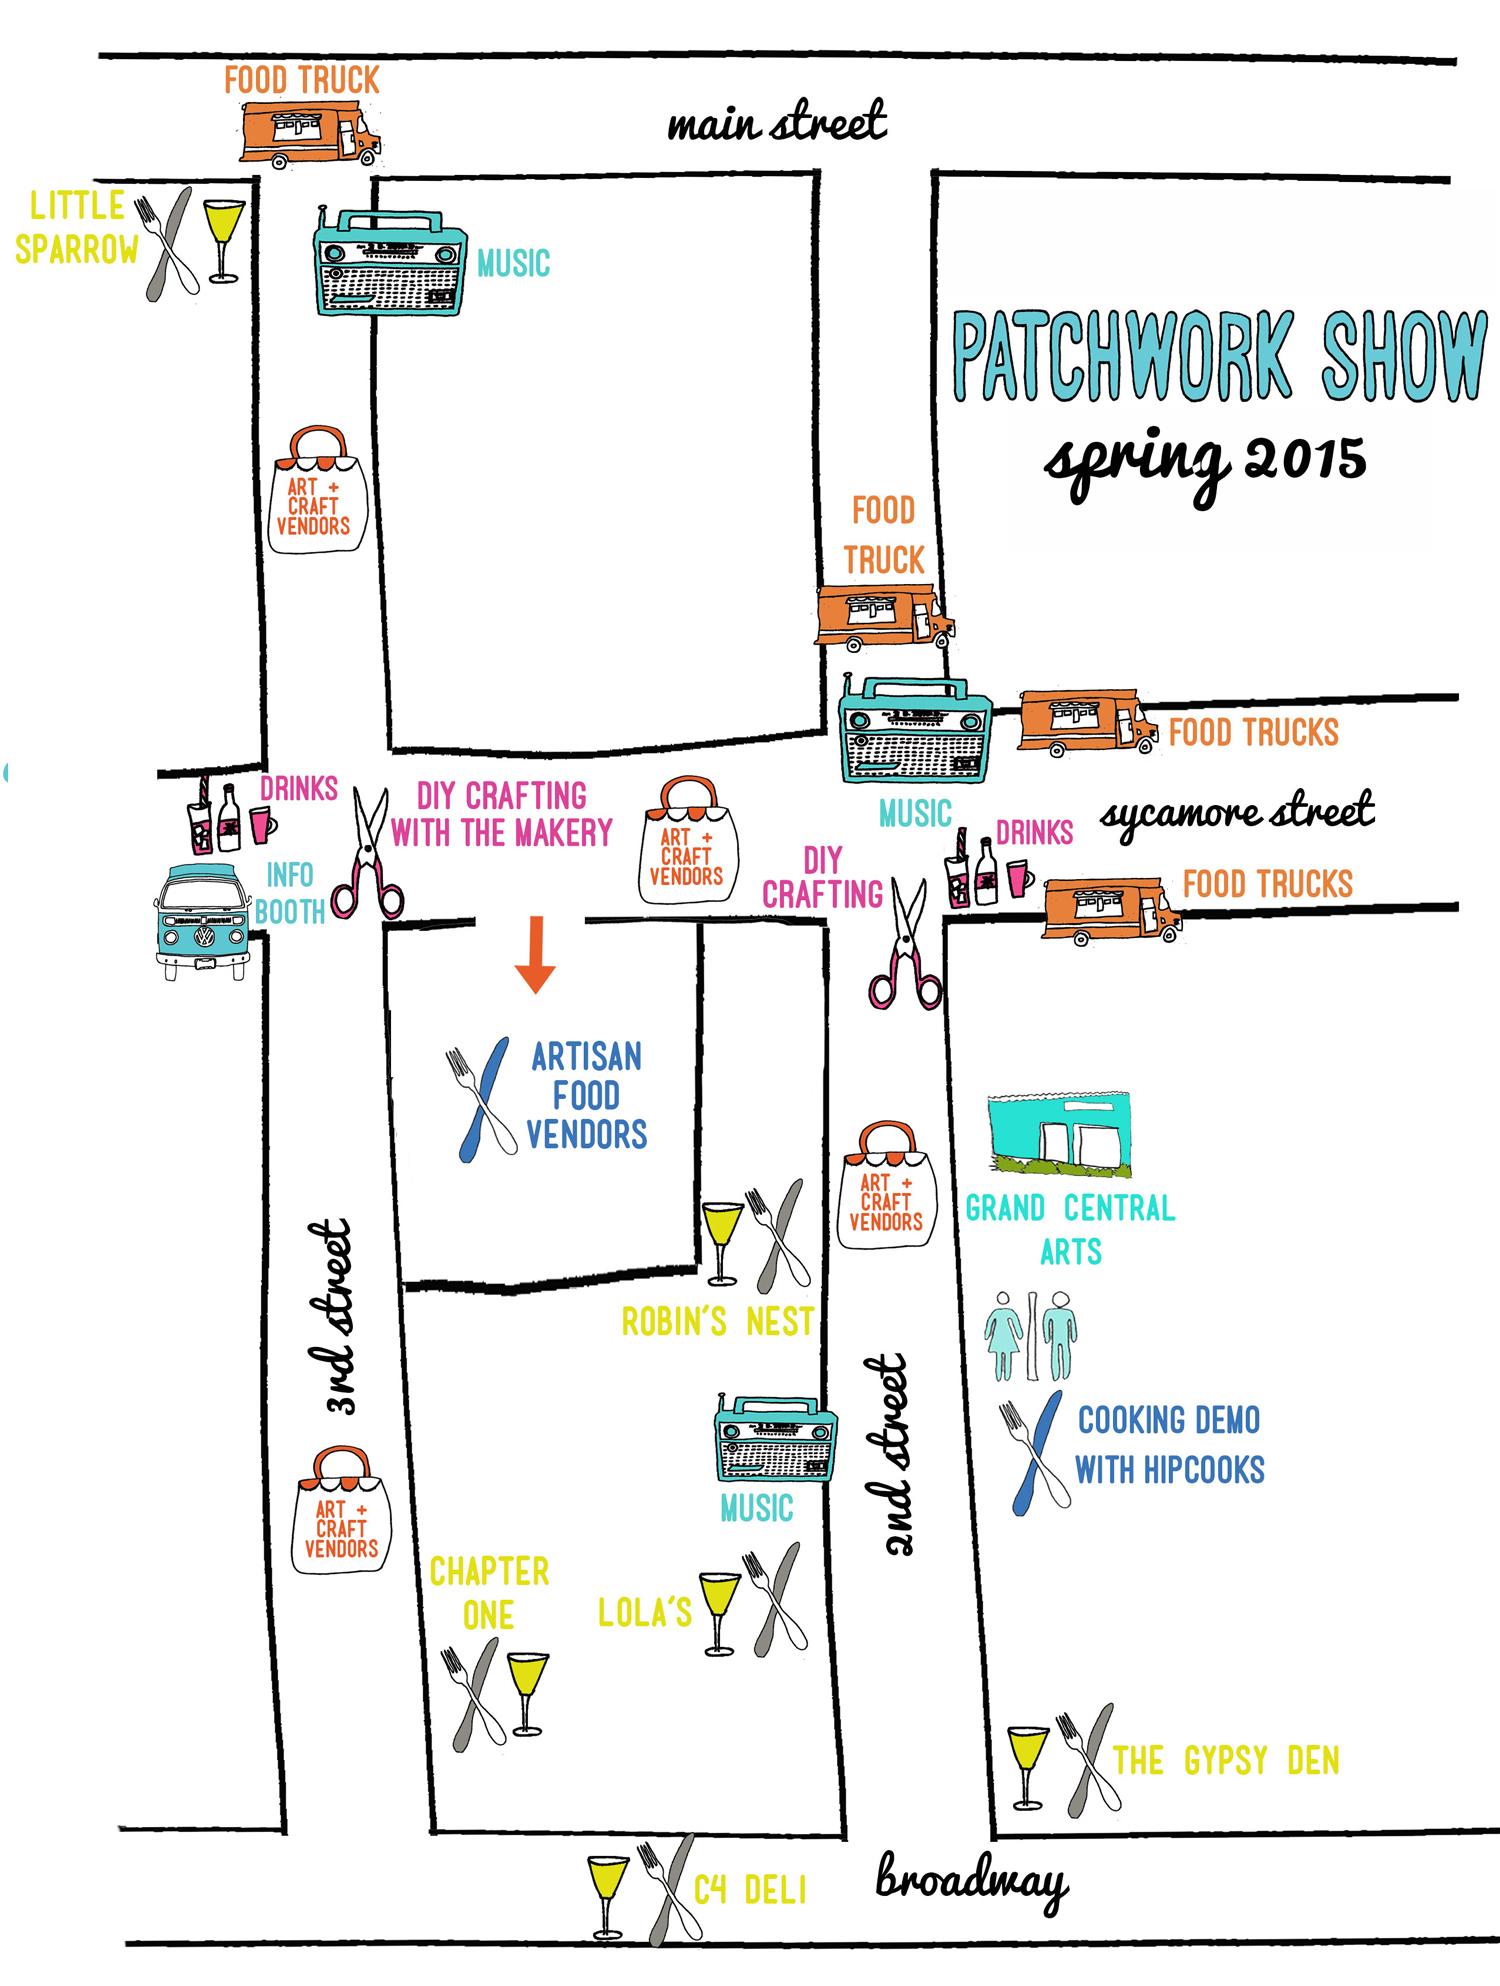 patchwork show craft fair custom illustrated design map.jpg